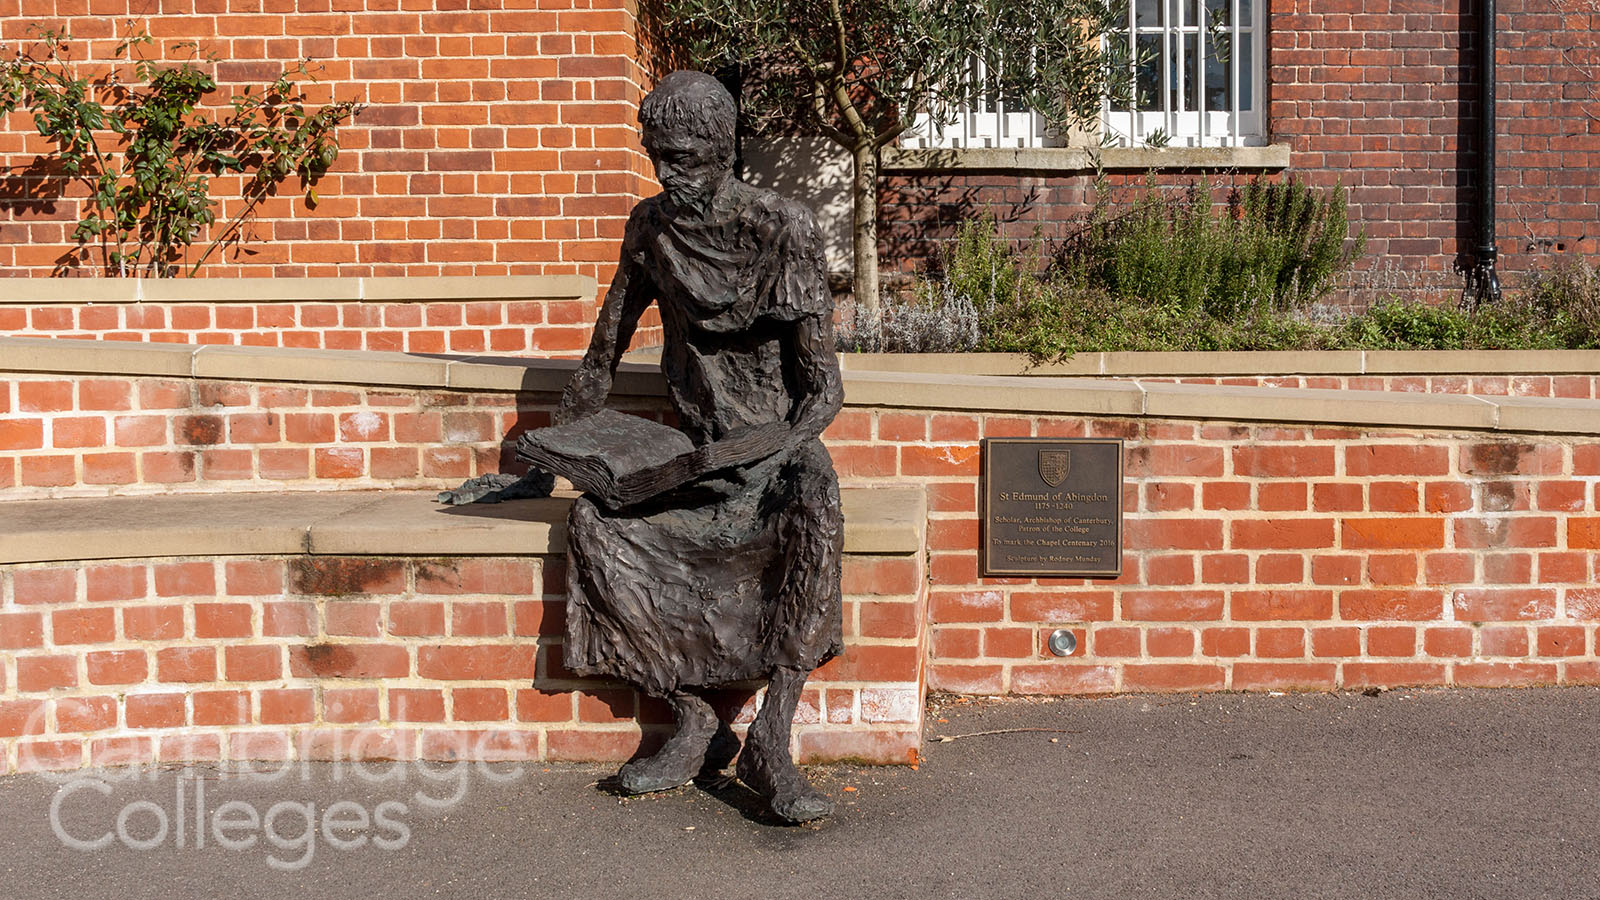 Statue of St Edmund at St Edmund's college, Cambridge